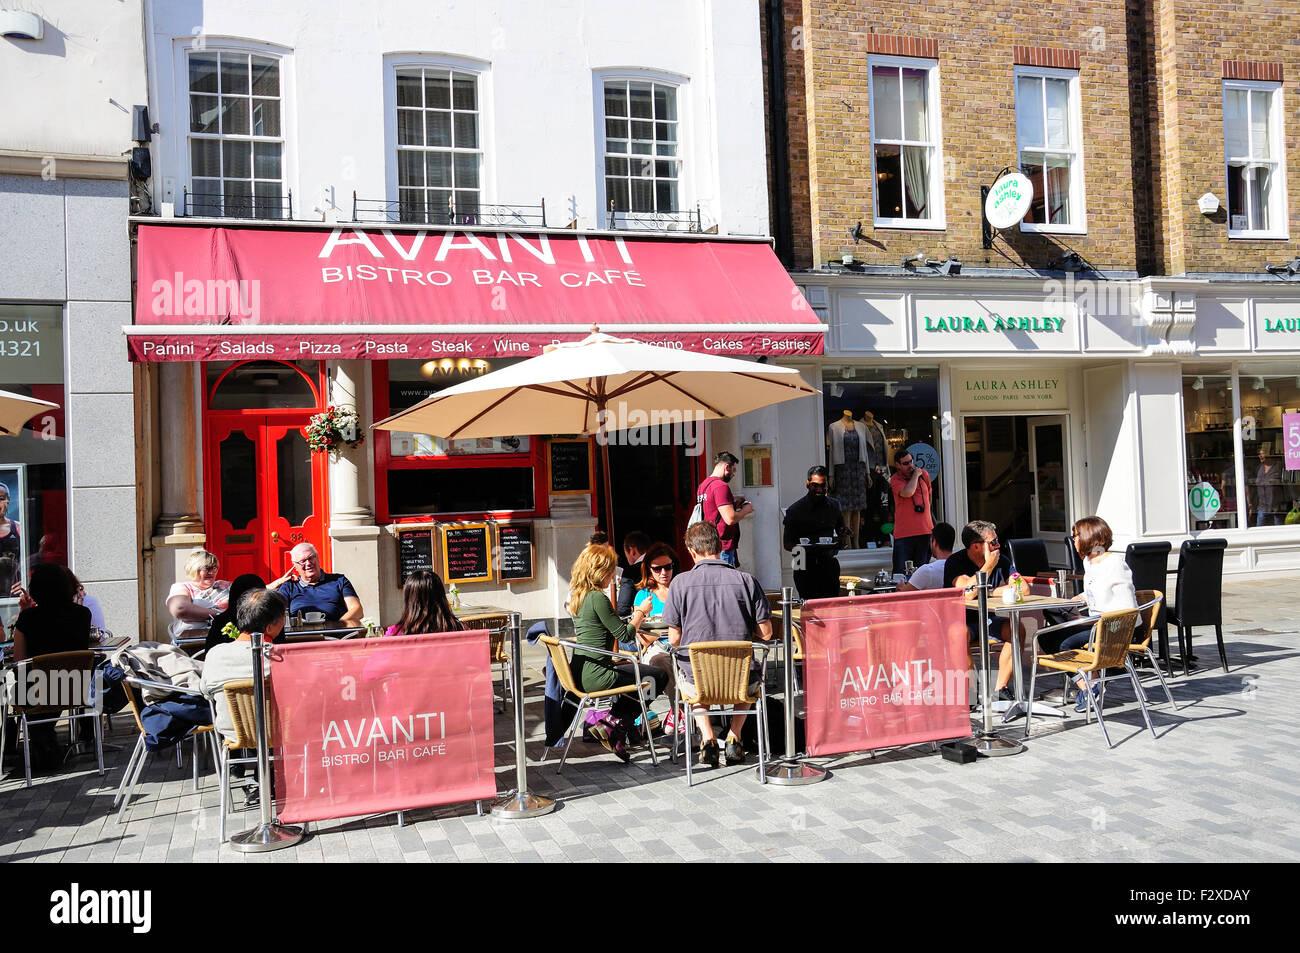 Avanti Bistro Bar Cafe, Peascod Street, Windsor, Berkshire, England, United Kingdom - Stock Image